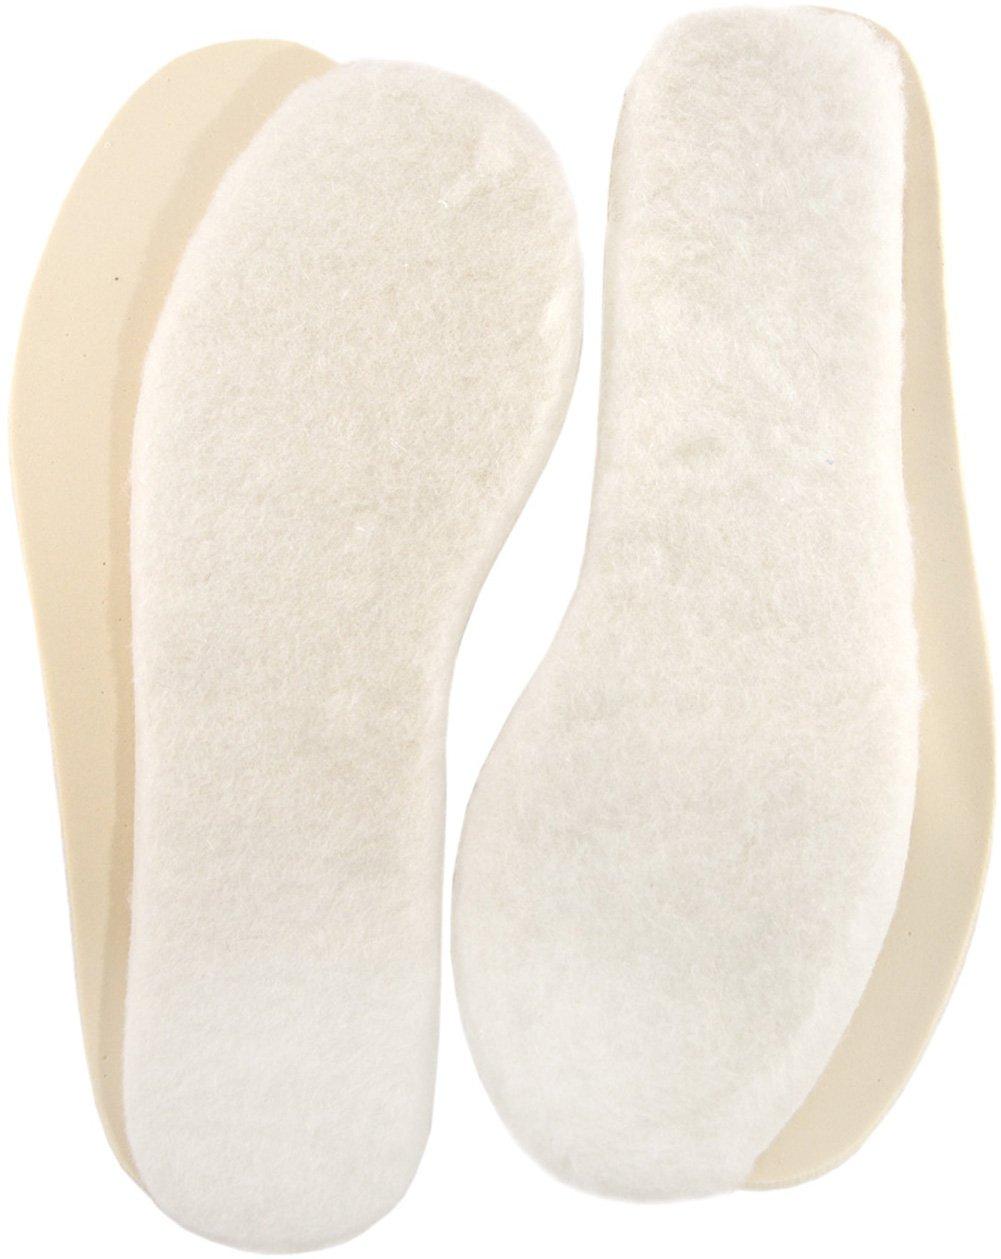 3X Sheepskin Lambswool Nice Inserts Thermal Pad Shoe Warm Fluffy Cushion Insoles